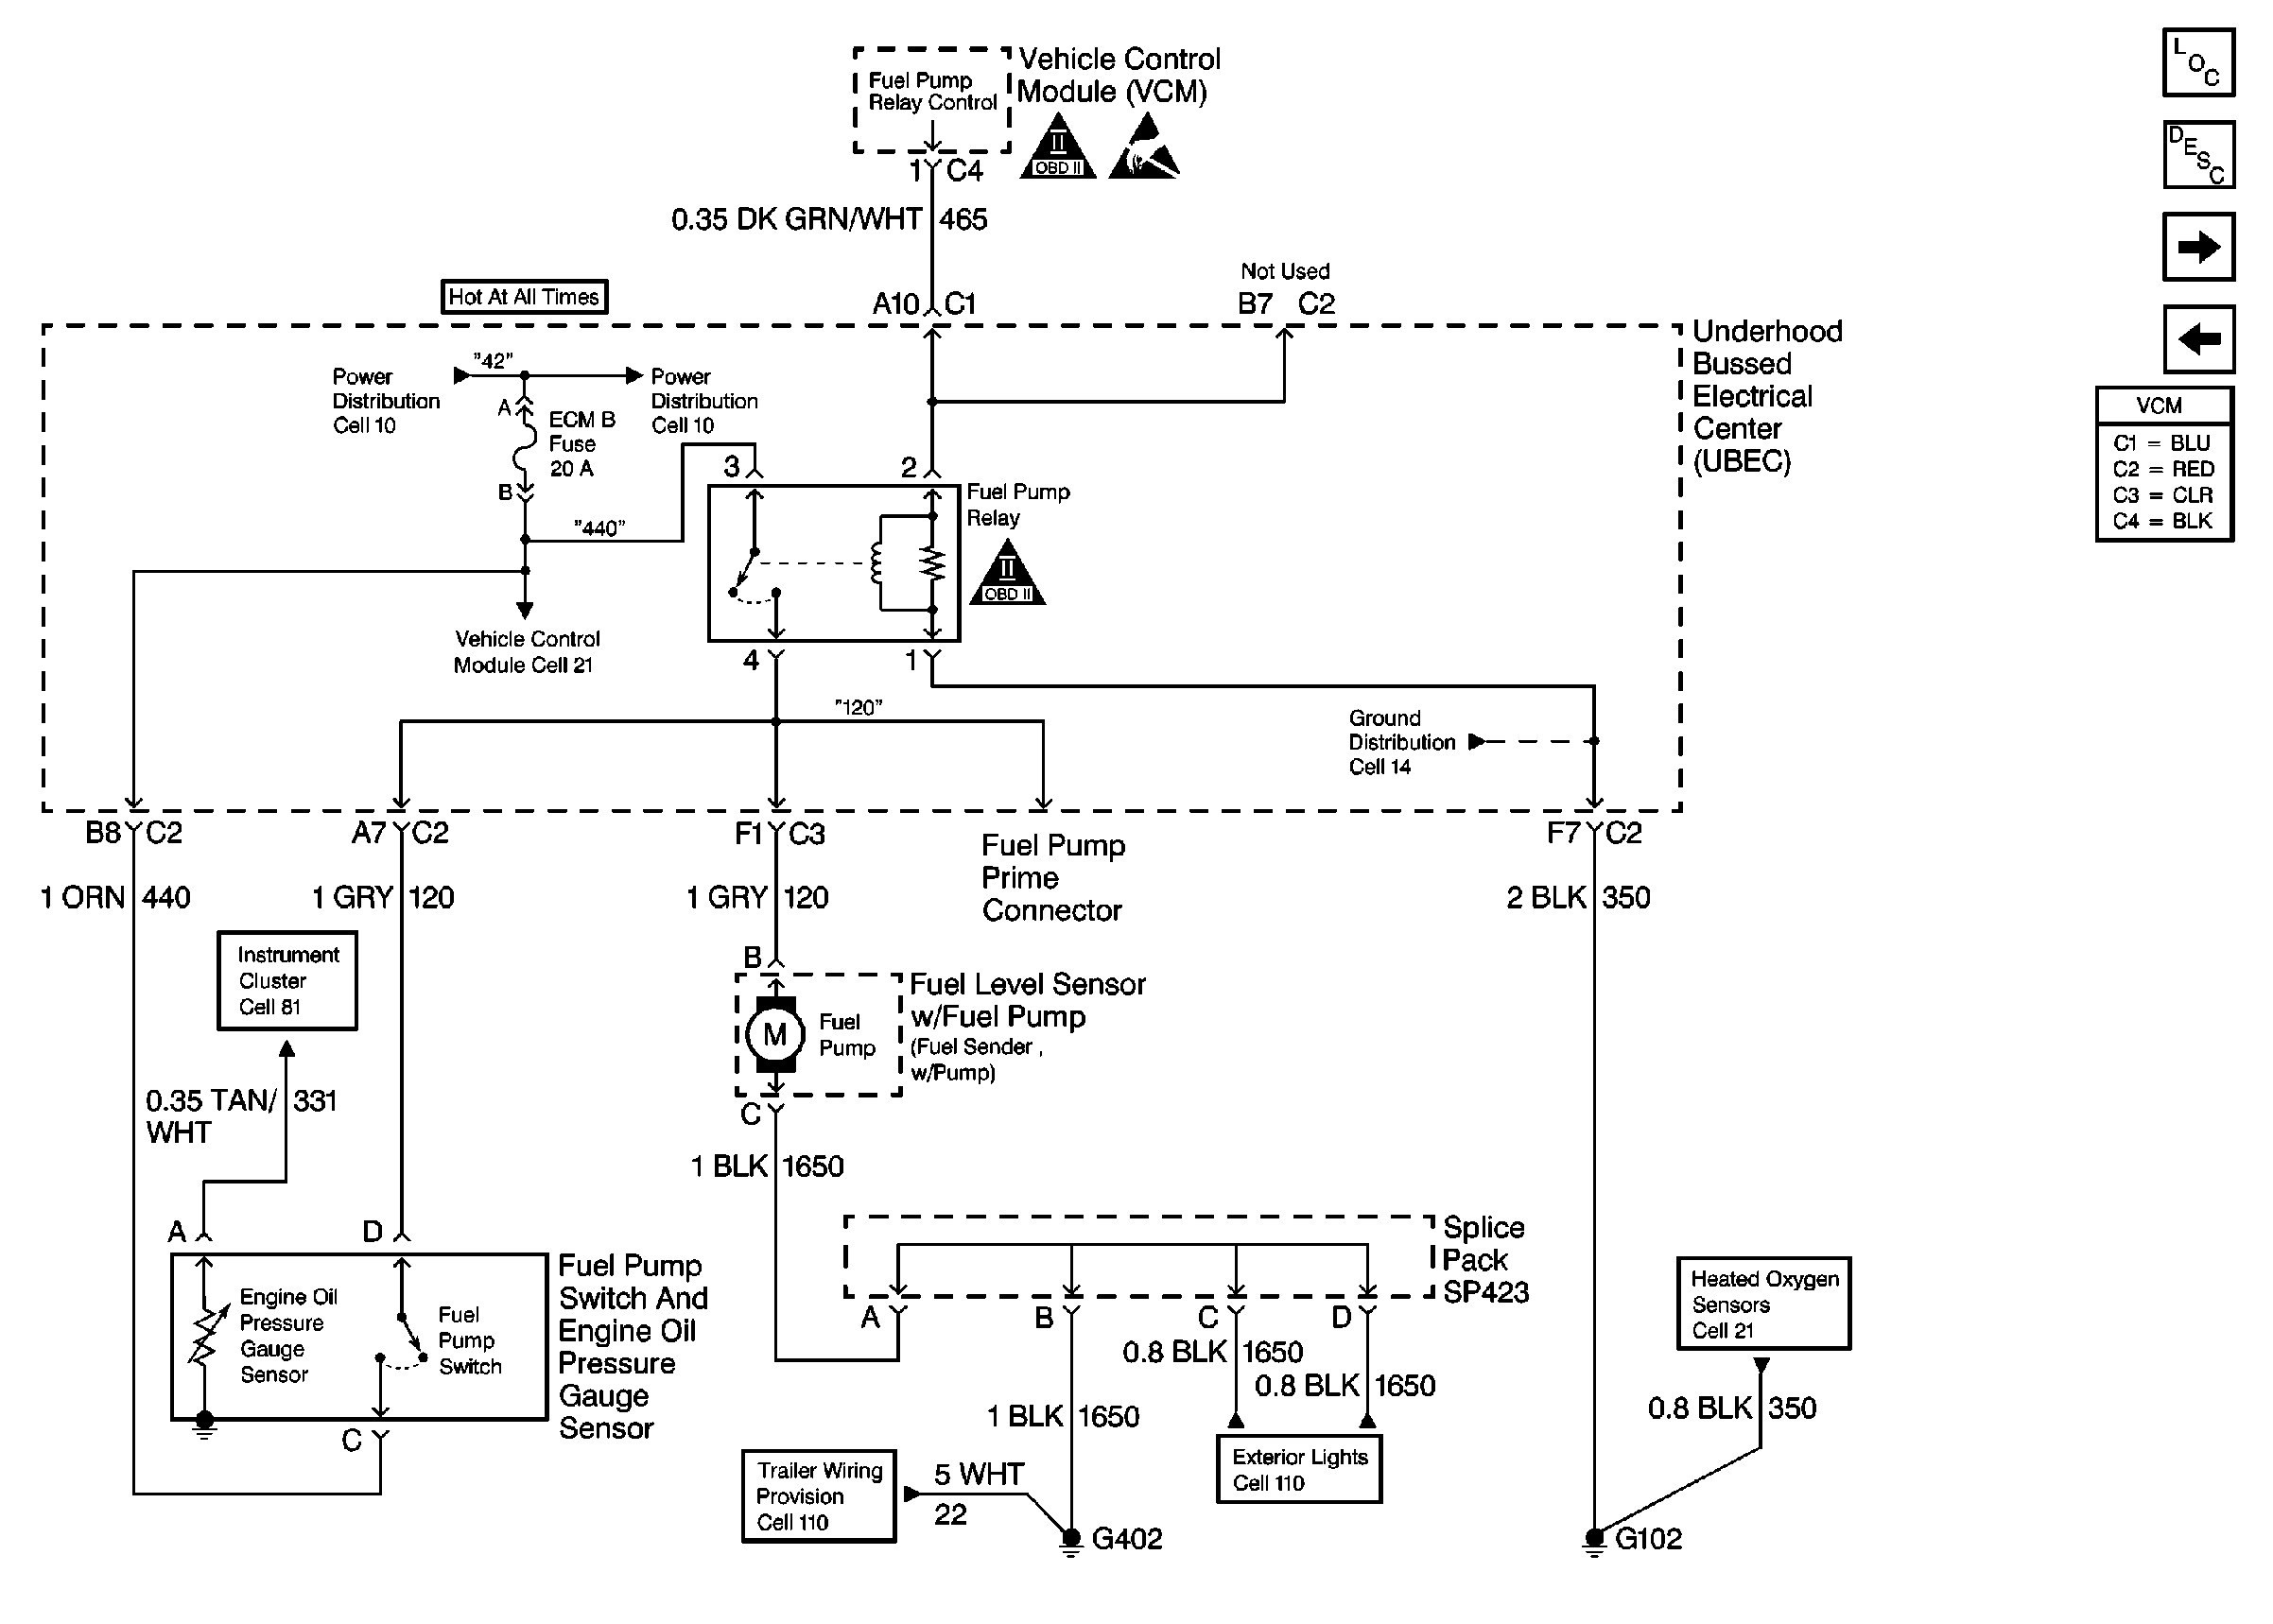 06D81 Marine Fuel Sending Unit Wiring Diagram | Wiring Resources 3 wire fuel sending unit Wiring Resources